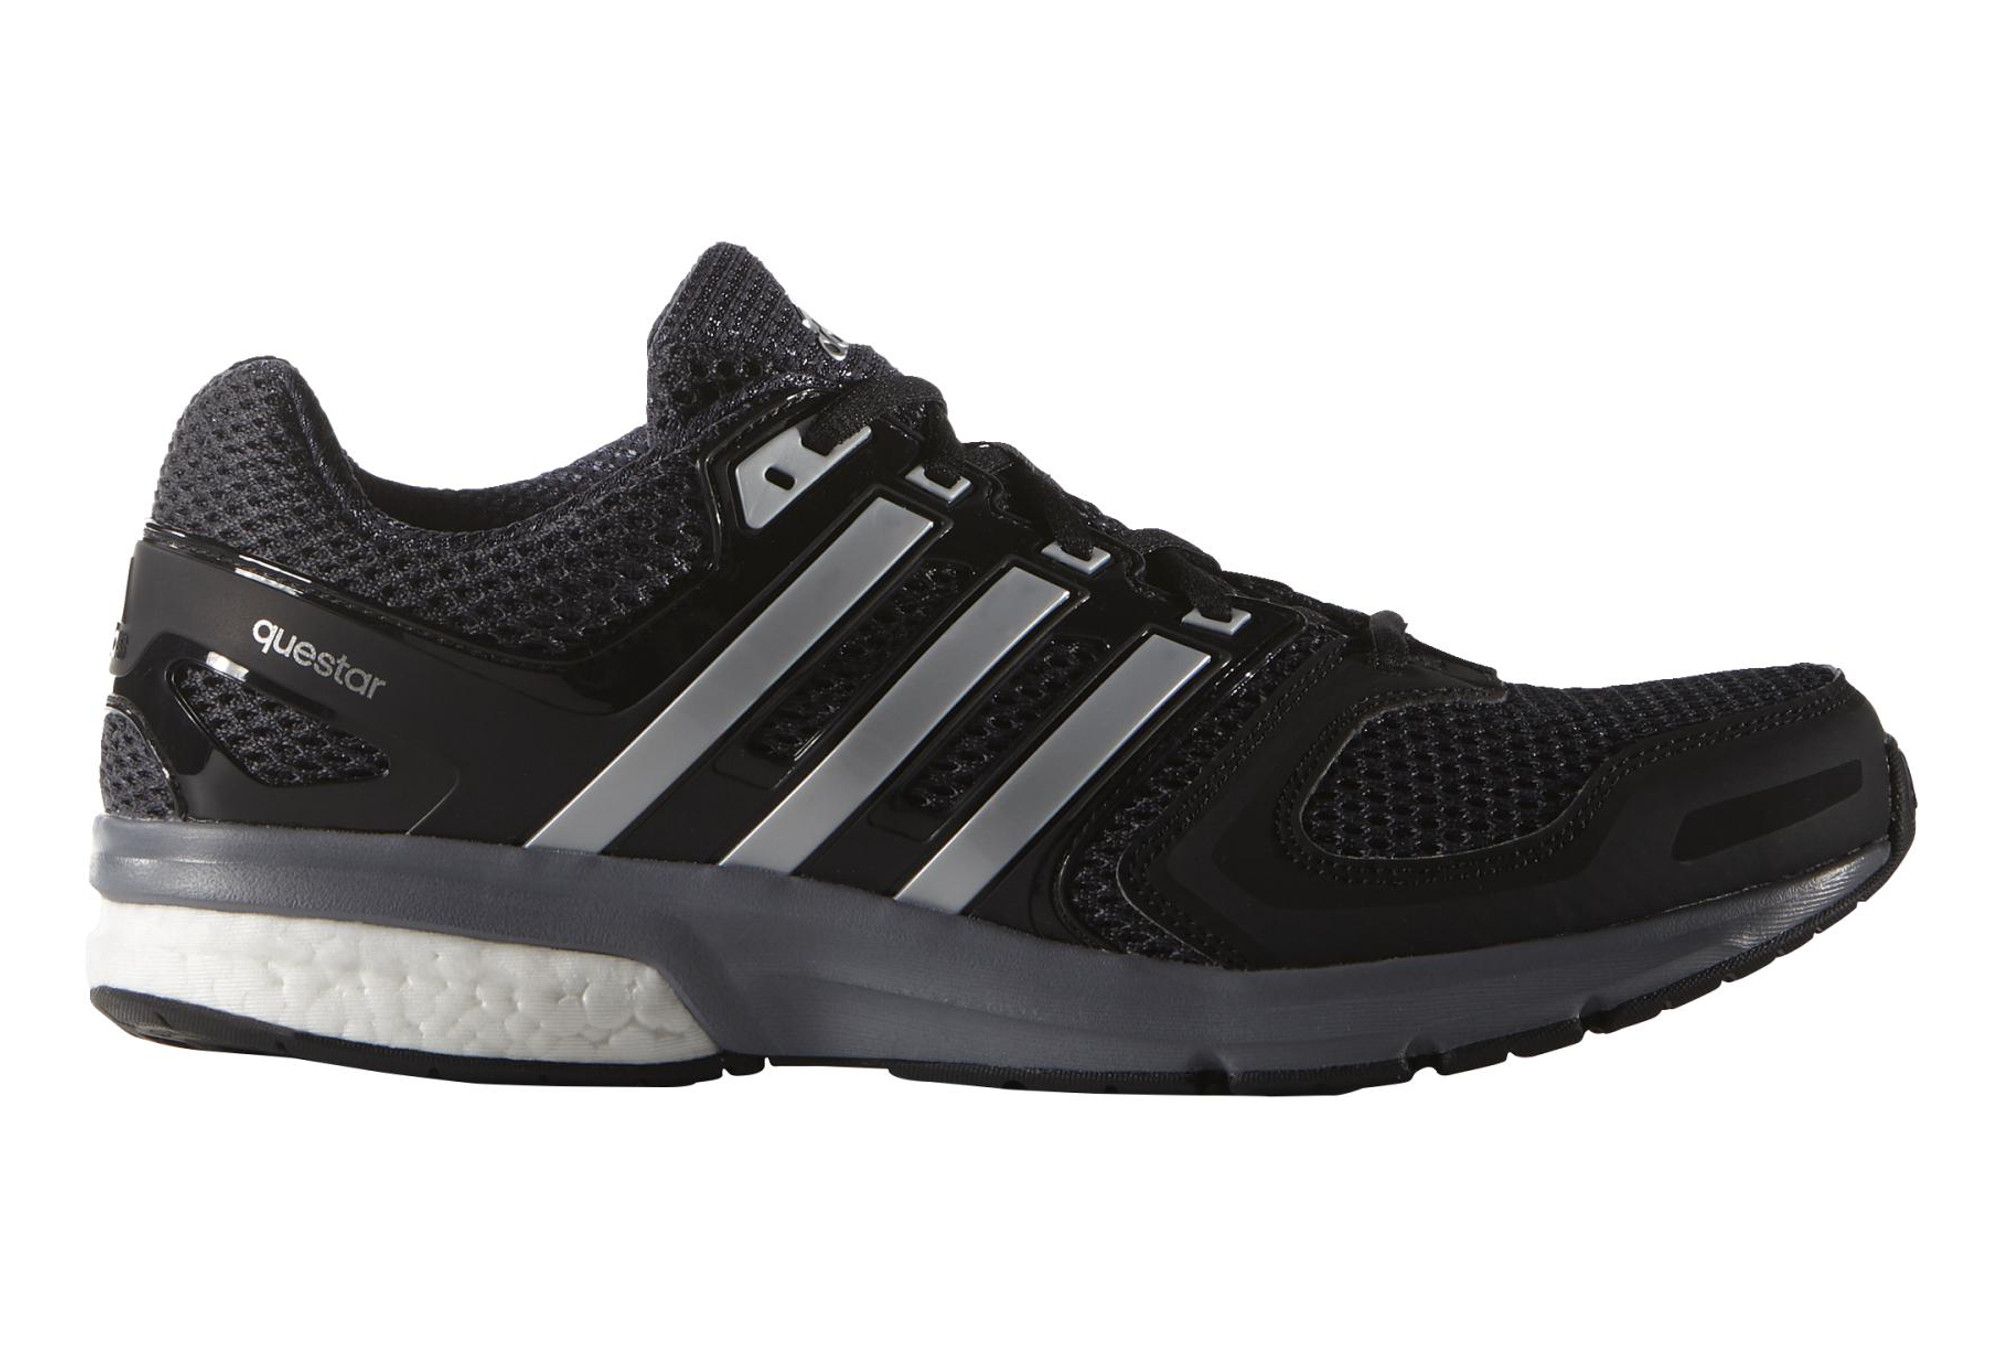 adidas QUESTAR BOOST Pair of Shoes Black